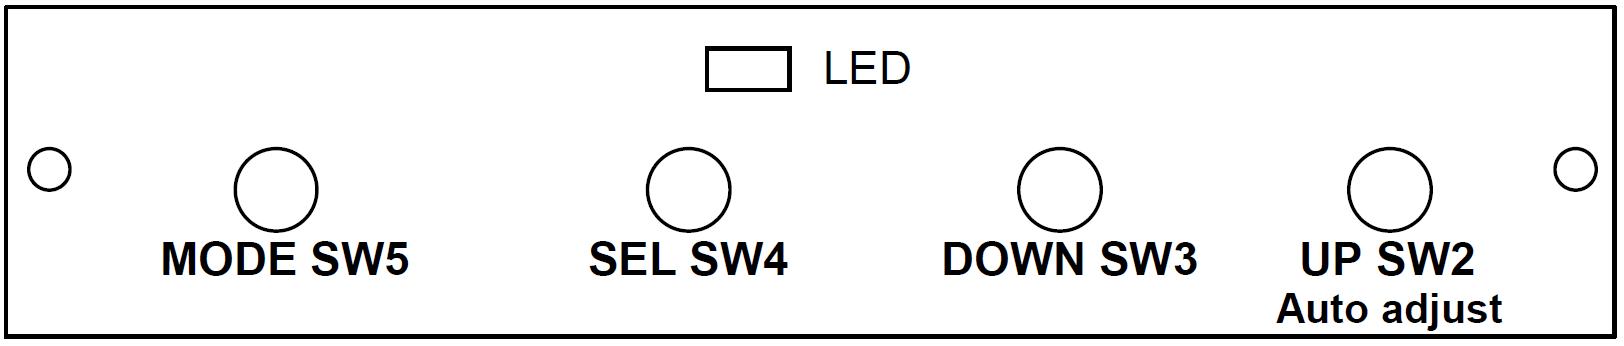 CGA LCD Auto - Manual Adjust